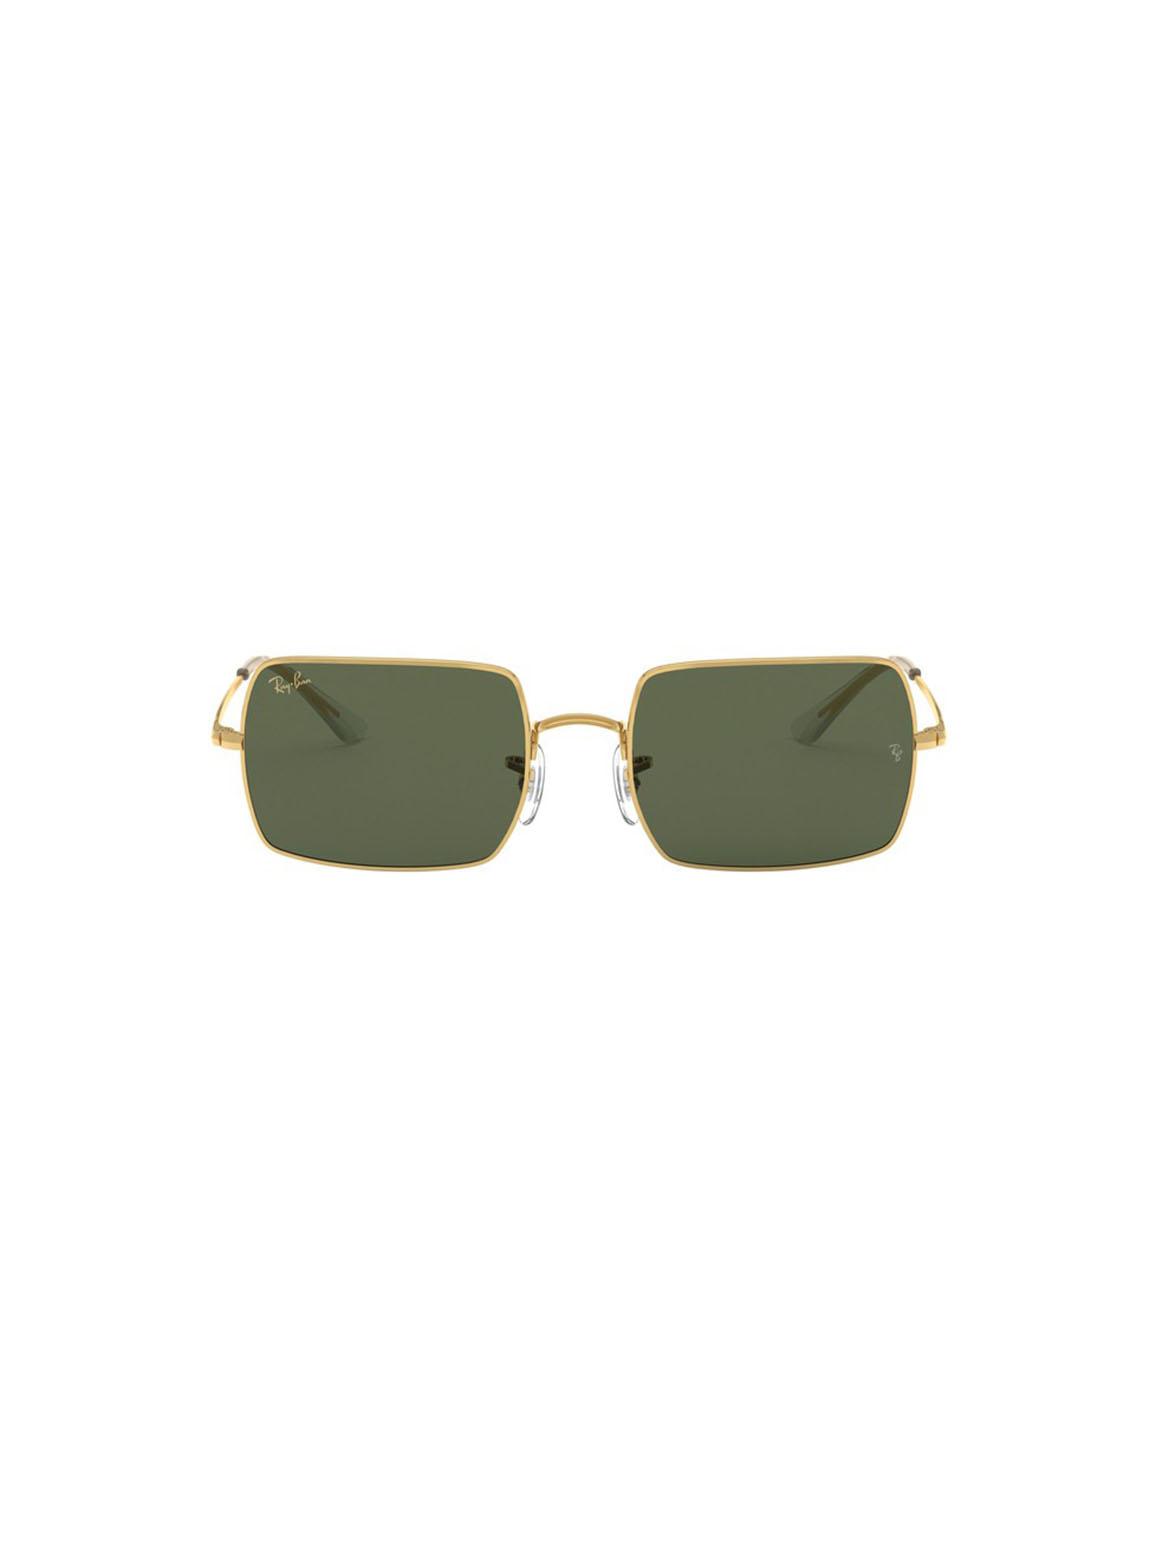 RB1969 Rectangle 1969 Sunglasses